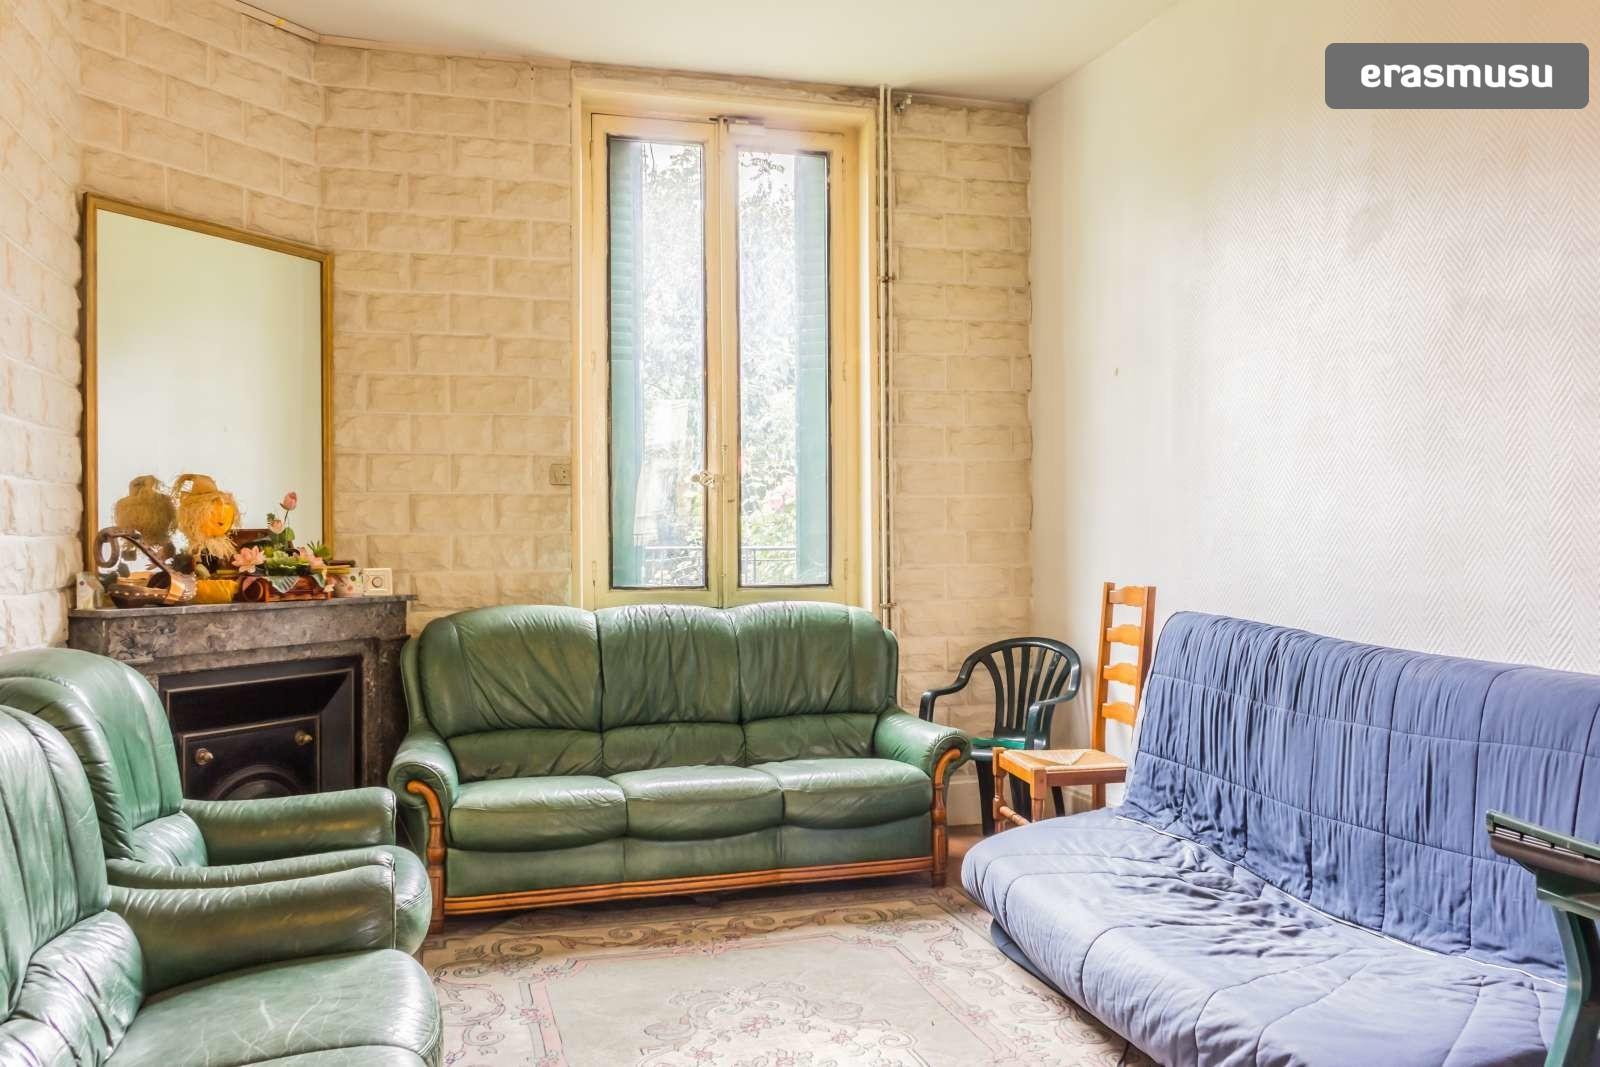 large-1-bedroom-apartment-dryer-rent-villeurbanne-area-8c021821f